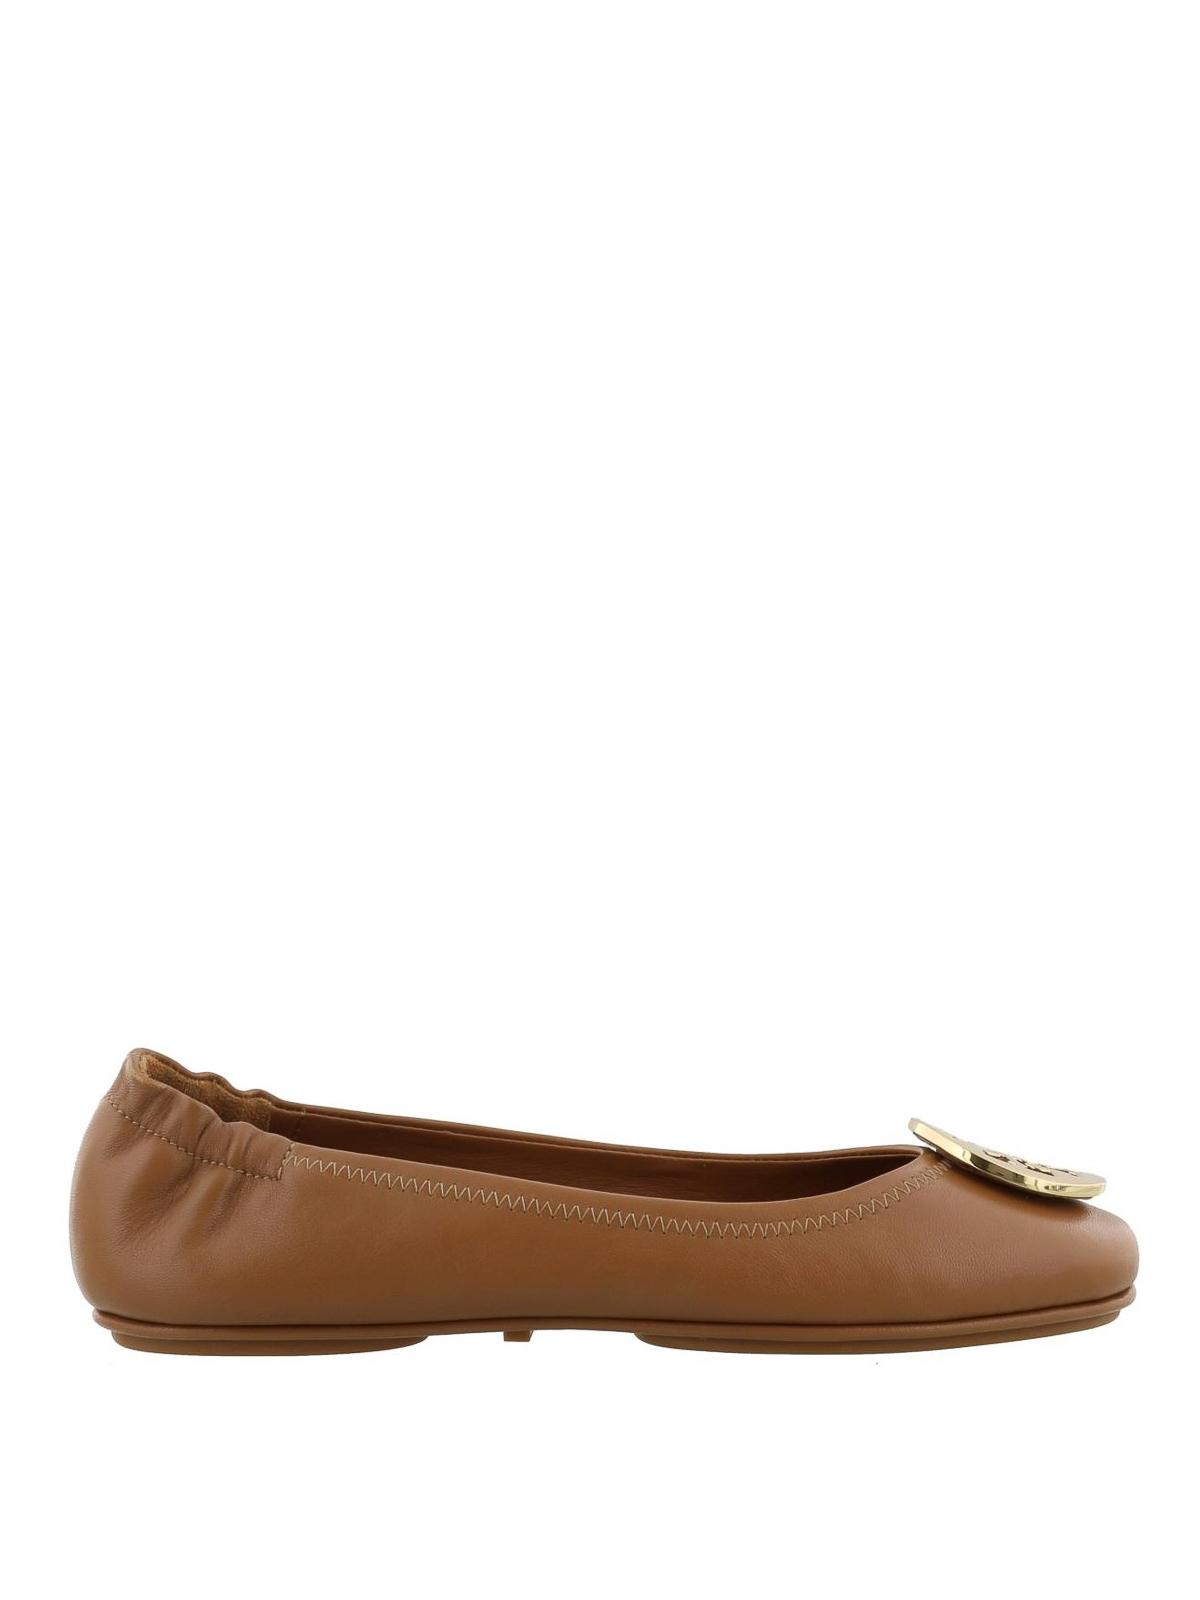 80ebafb51b6a Tory Burch - Minnie Travel ballet flats - flat shoes - 32880 232